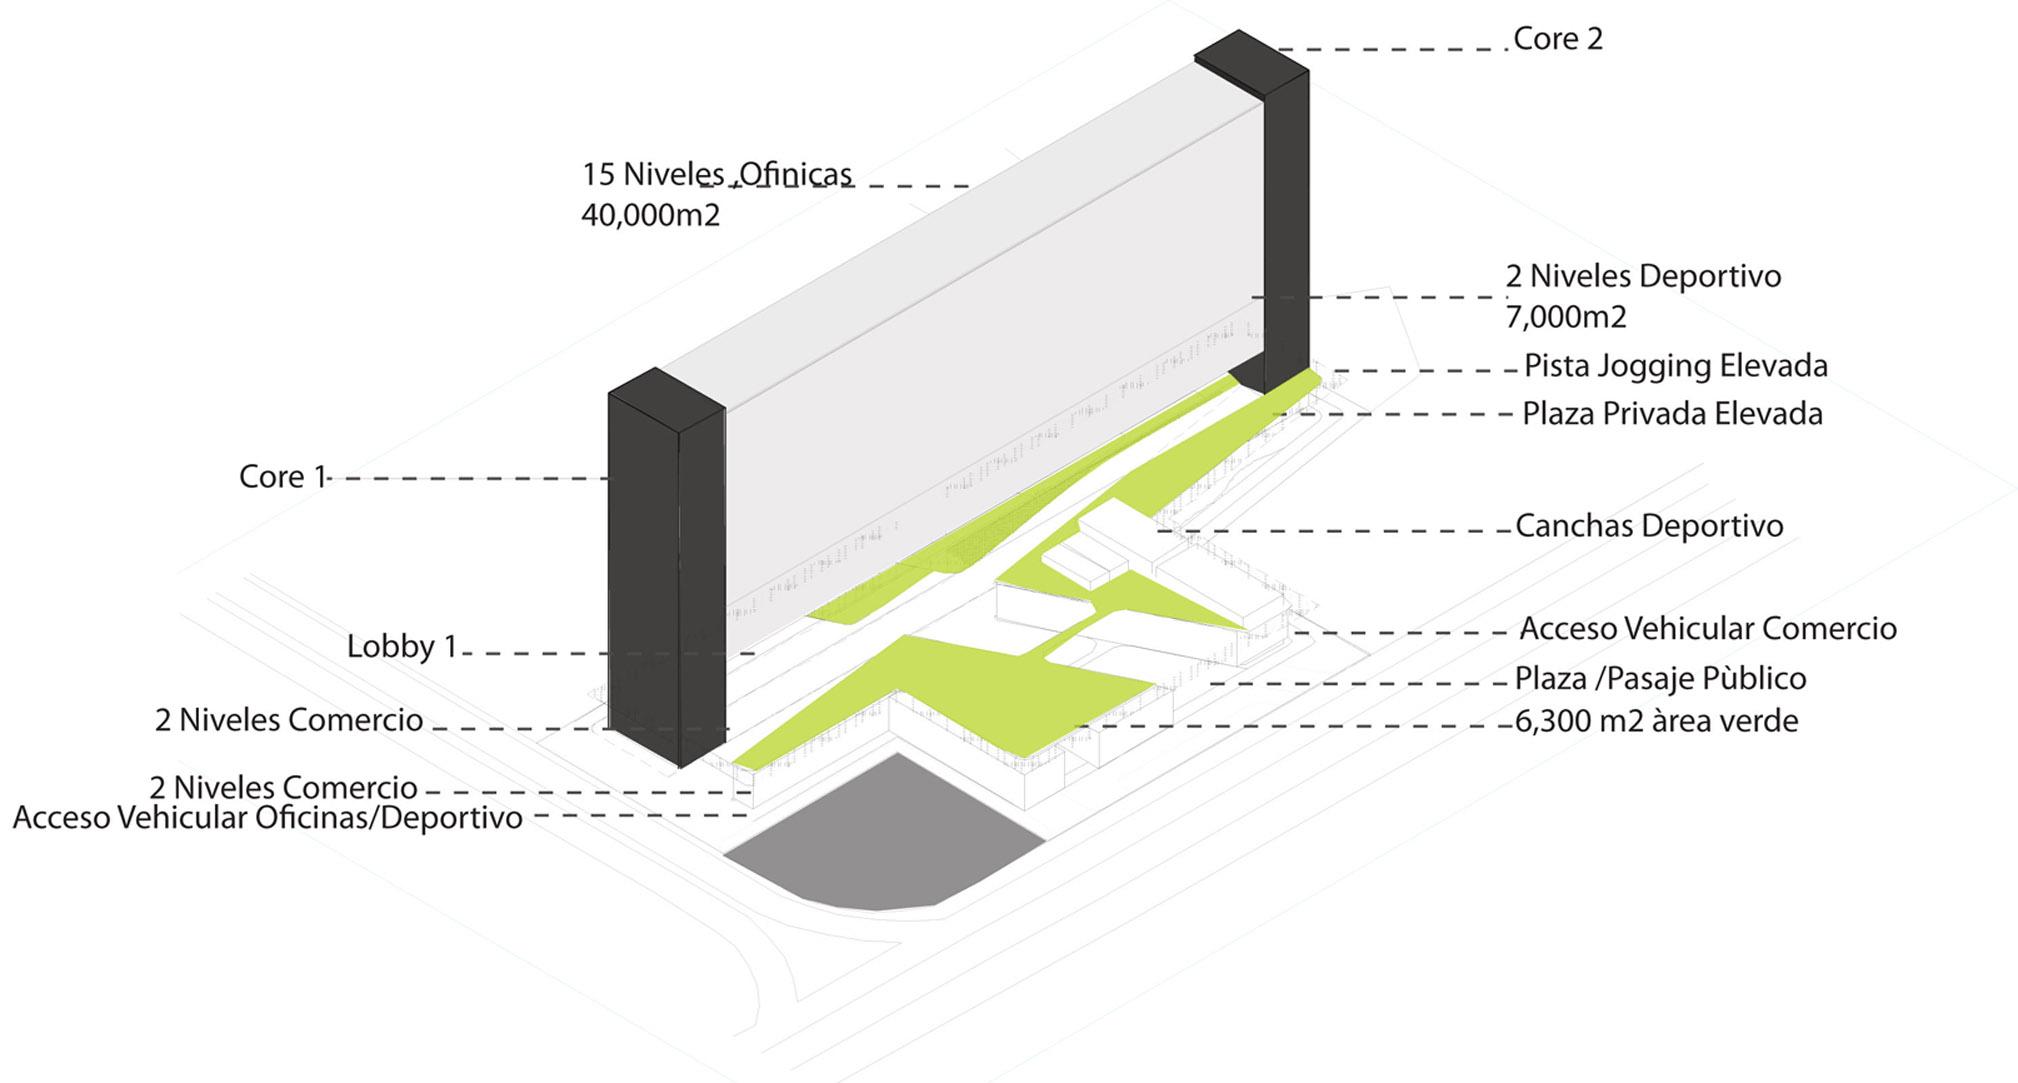 Concepto arquitect nico arquitectura en red for Programas de arquitectura y diseno